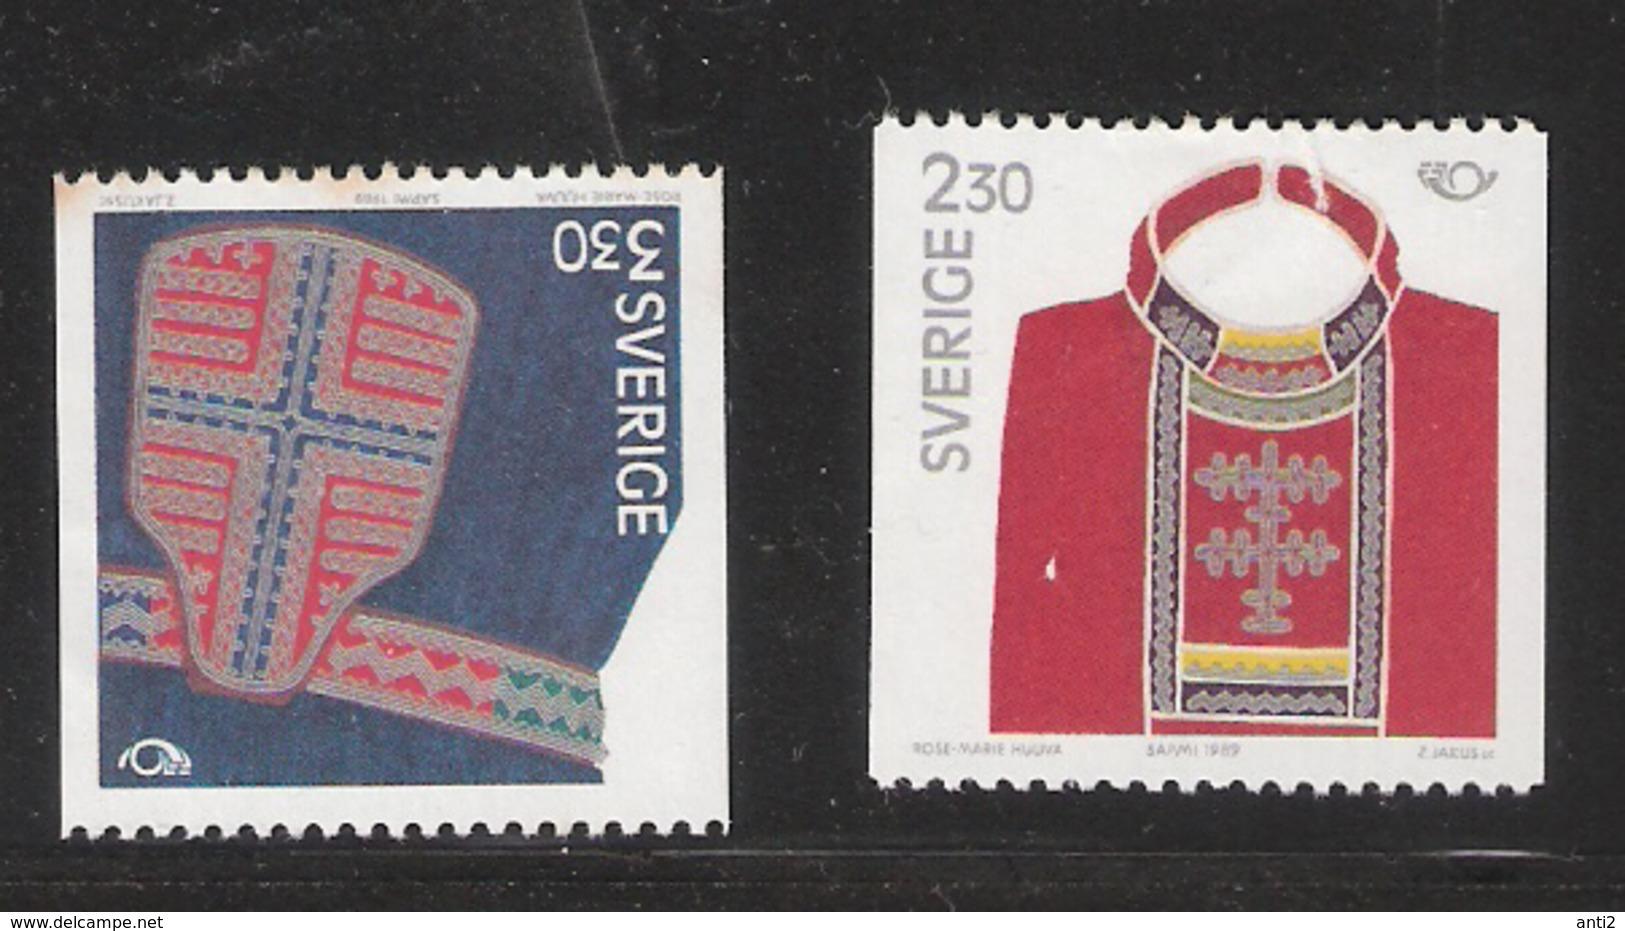 Sweden 1989 Norden: Parts Of Lapland Costumes, Chest Cloth, Belt Bag Mi  1537-1538  MNH(**) - Sweden